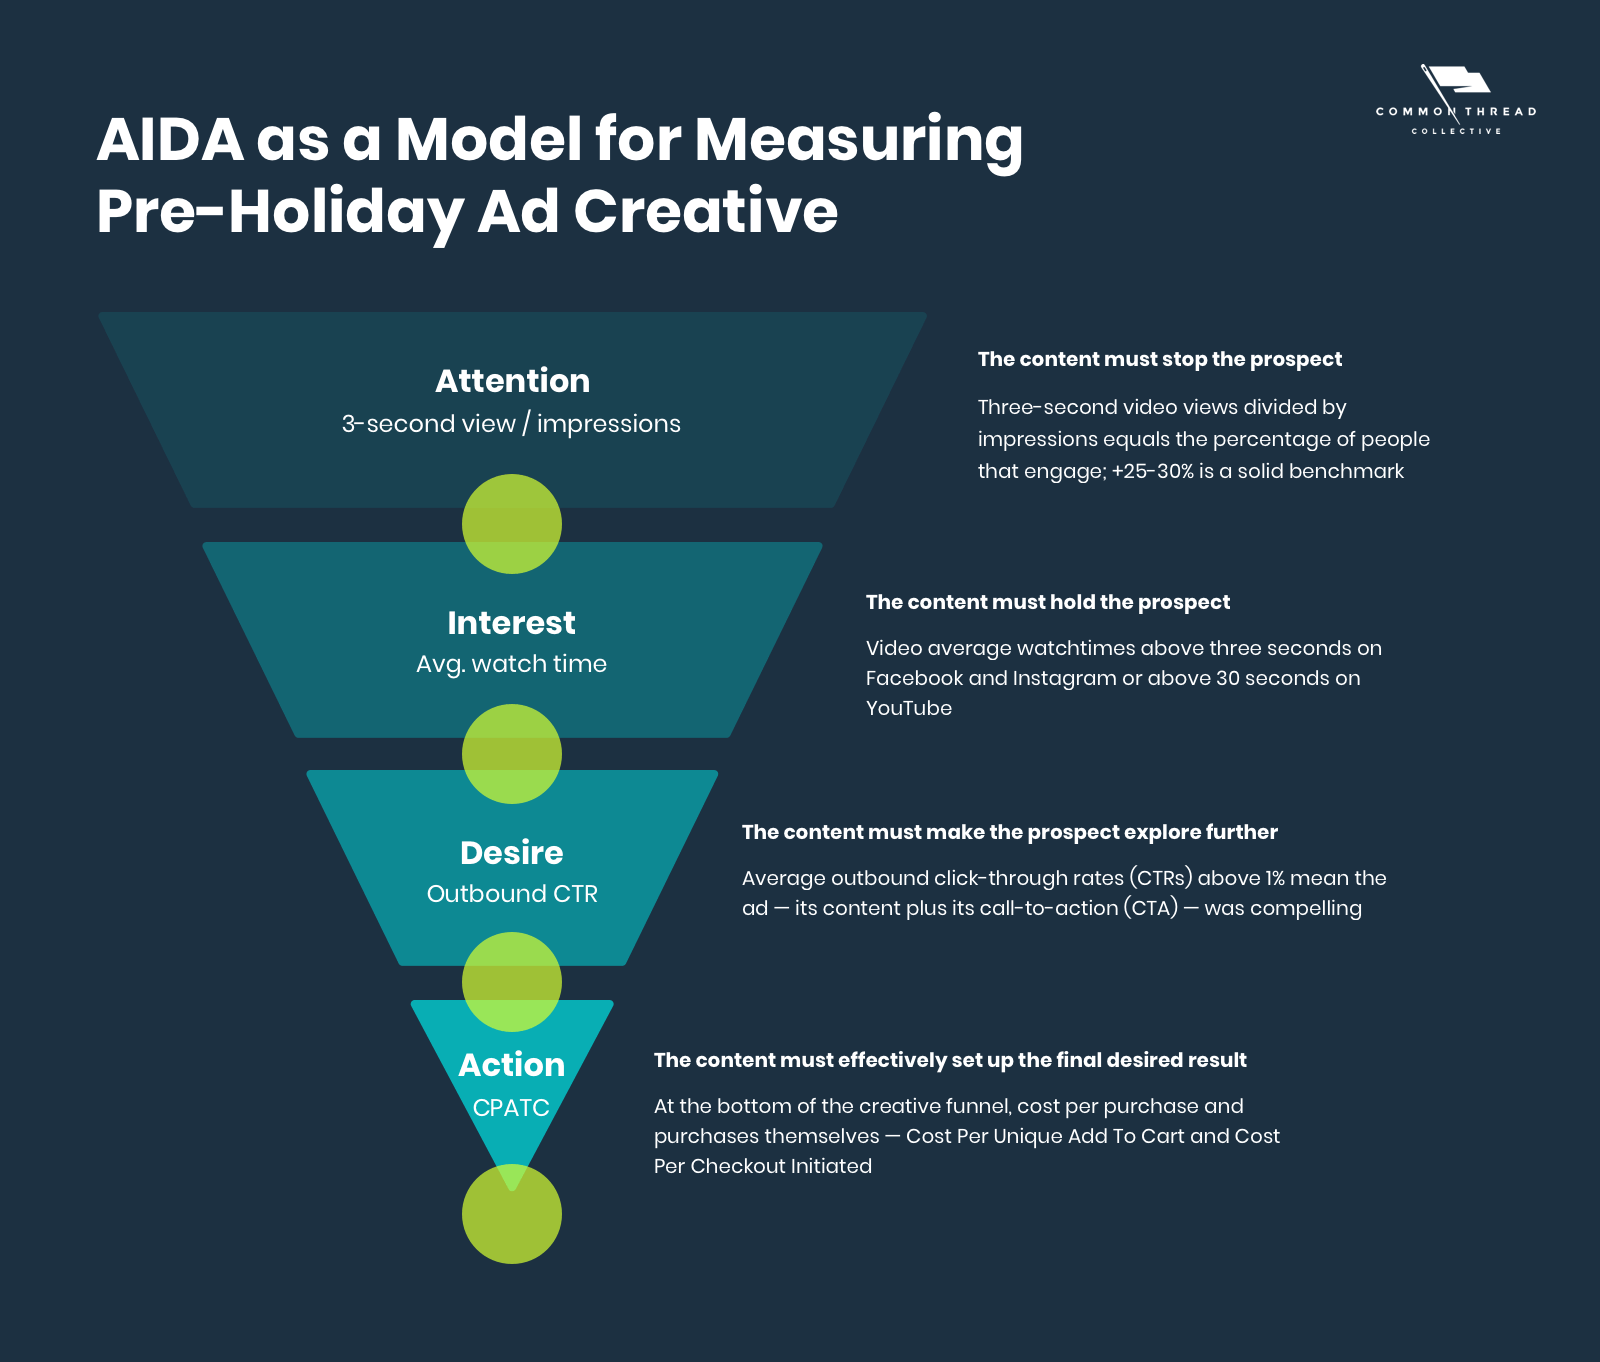 AIDA as a Model for Measuring Pre-Holiday Ad Creative